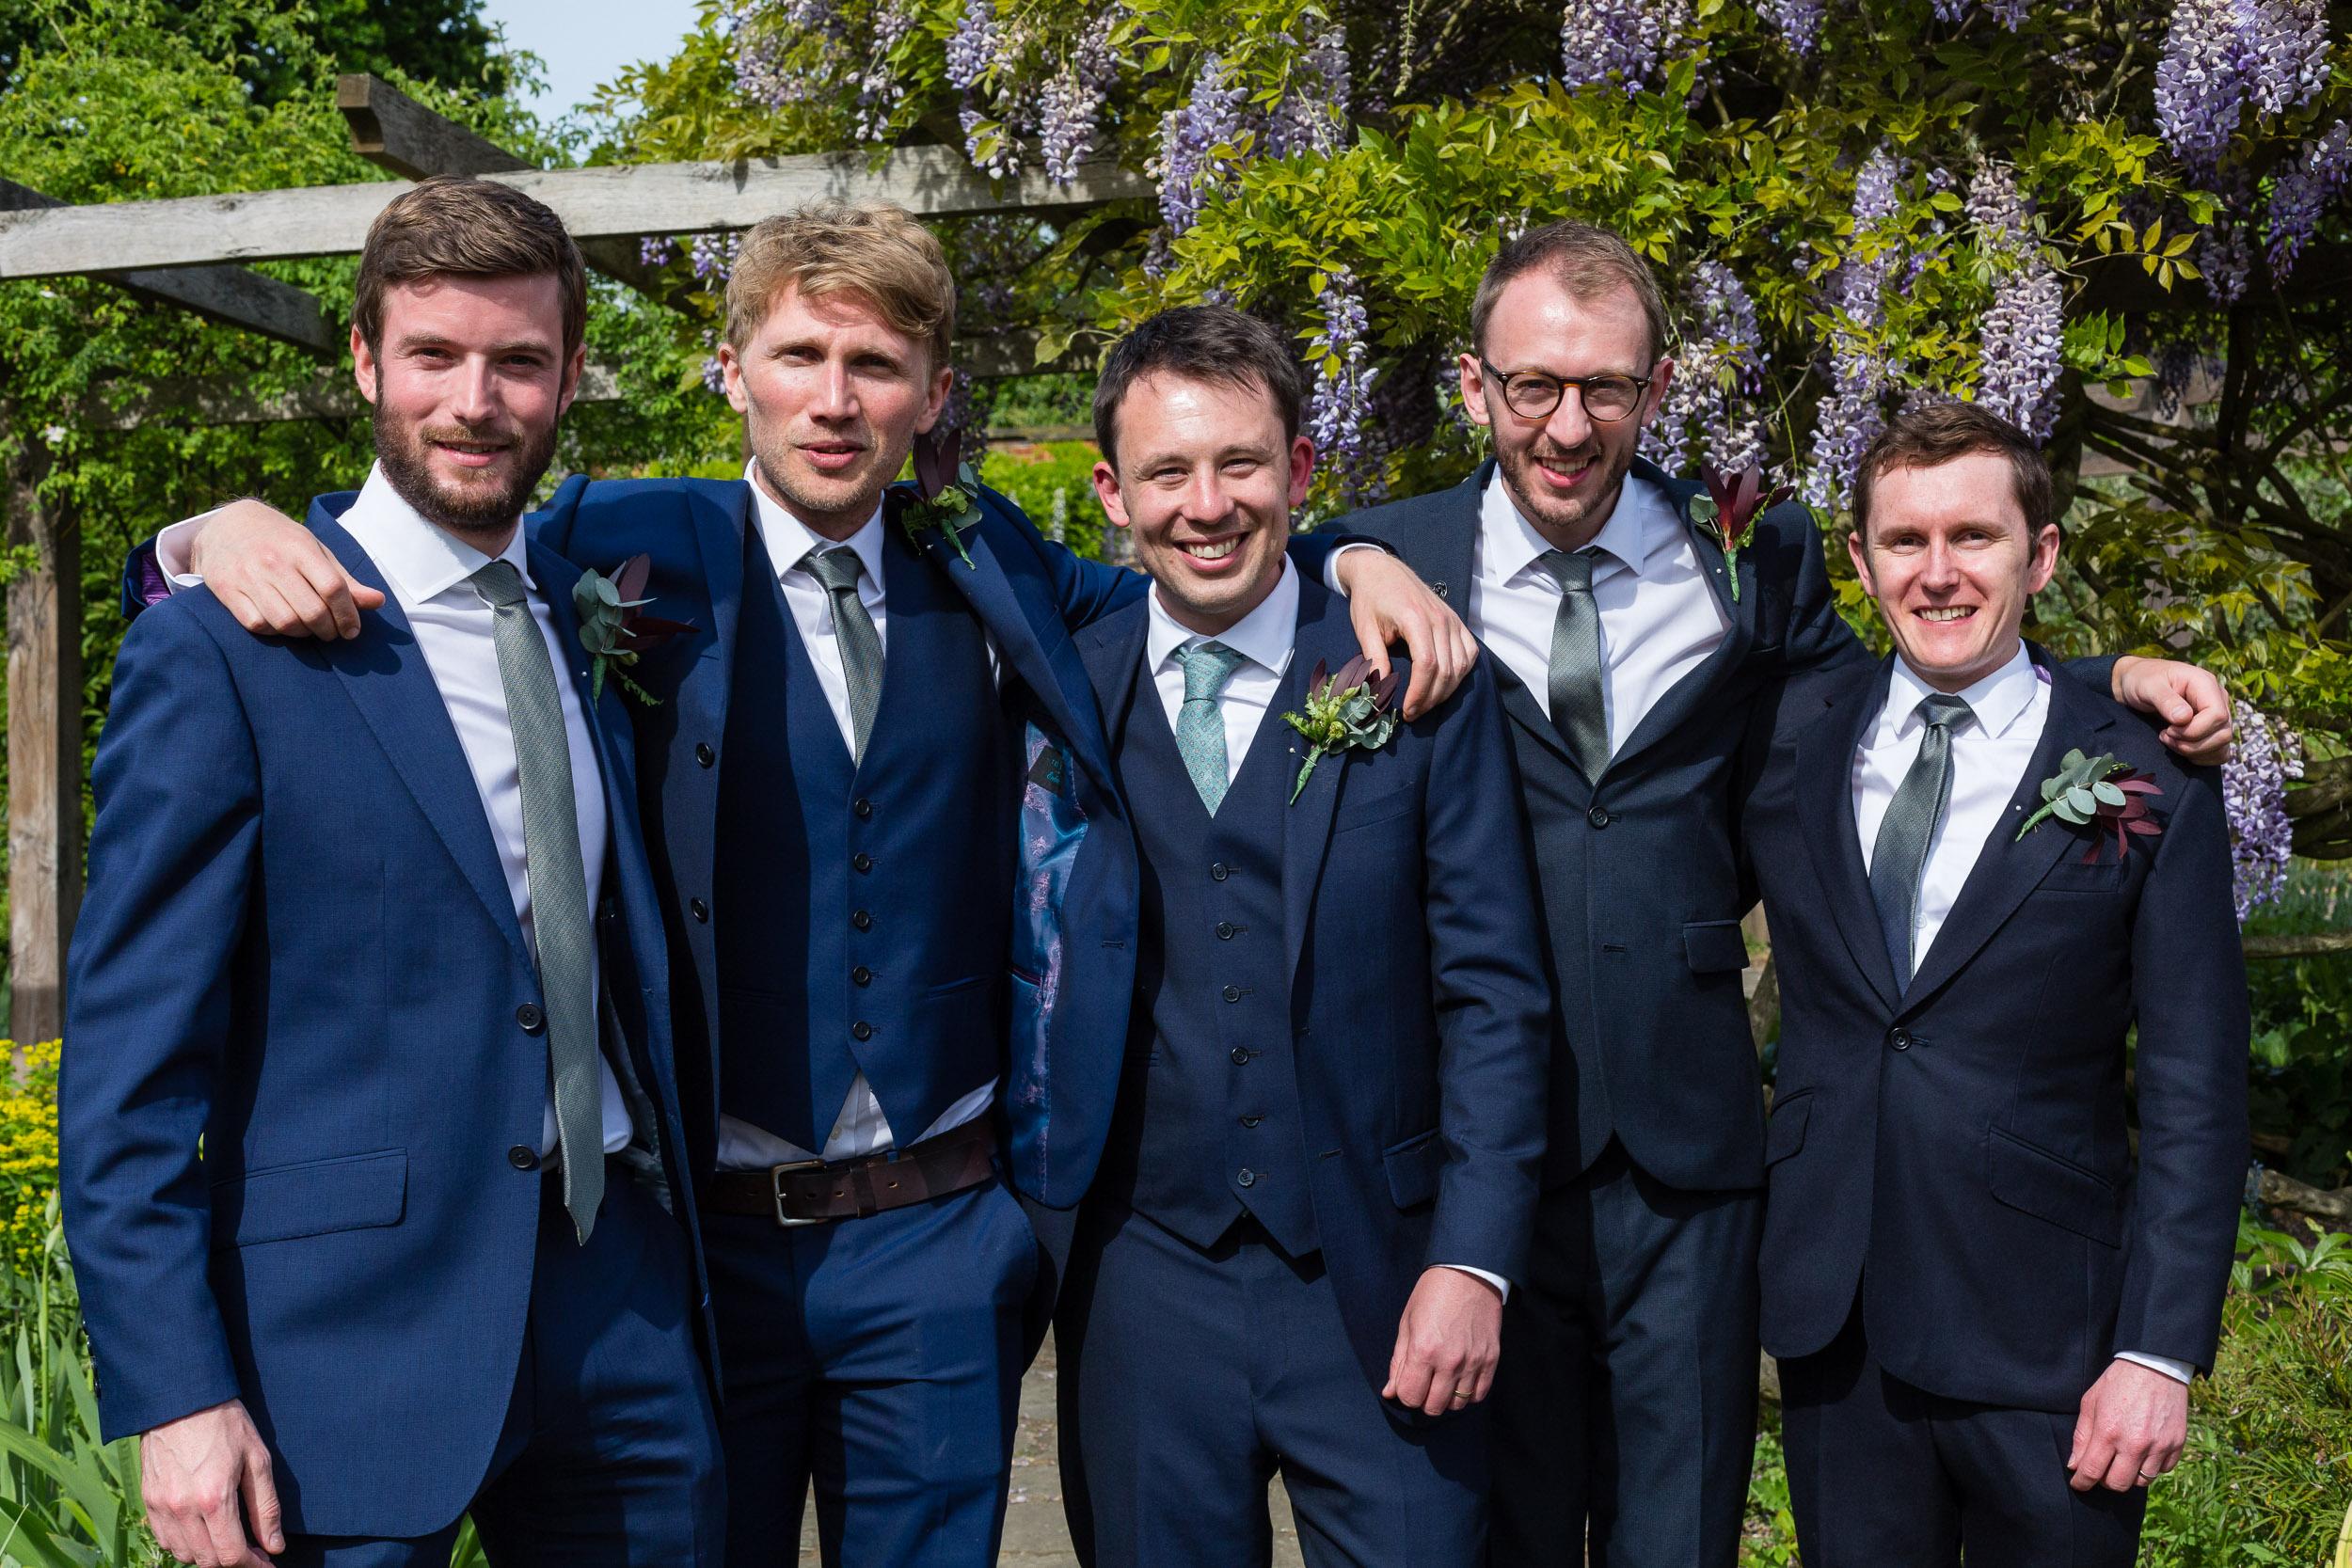 brockwell-lido-brixton-herne-hill-wedding-267.jpg